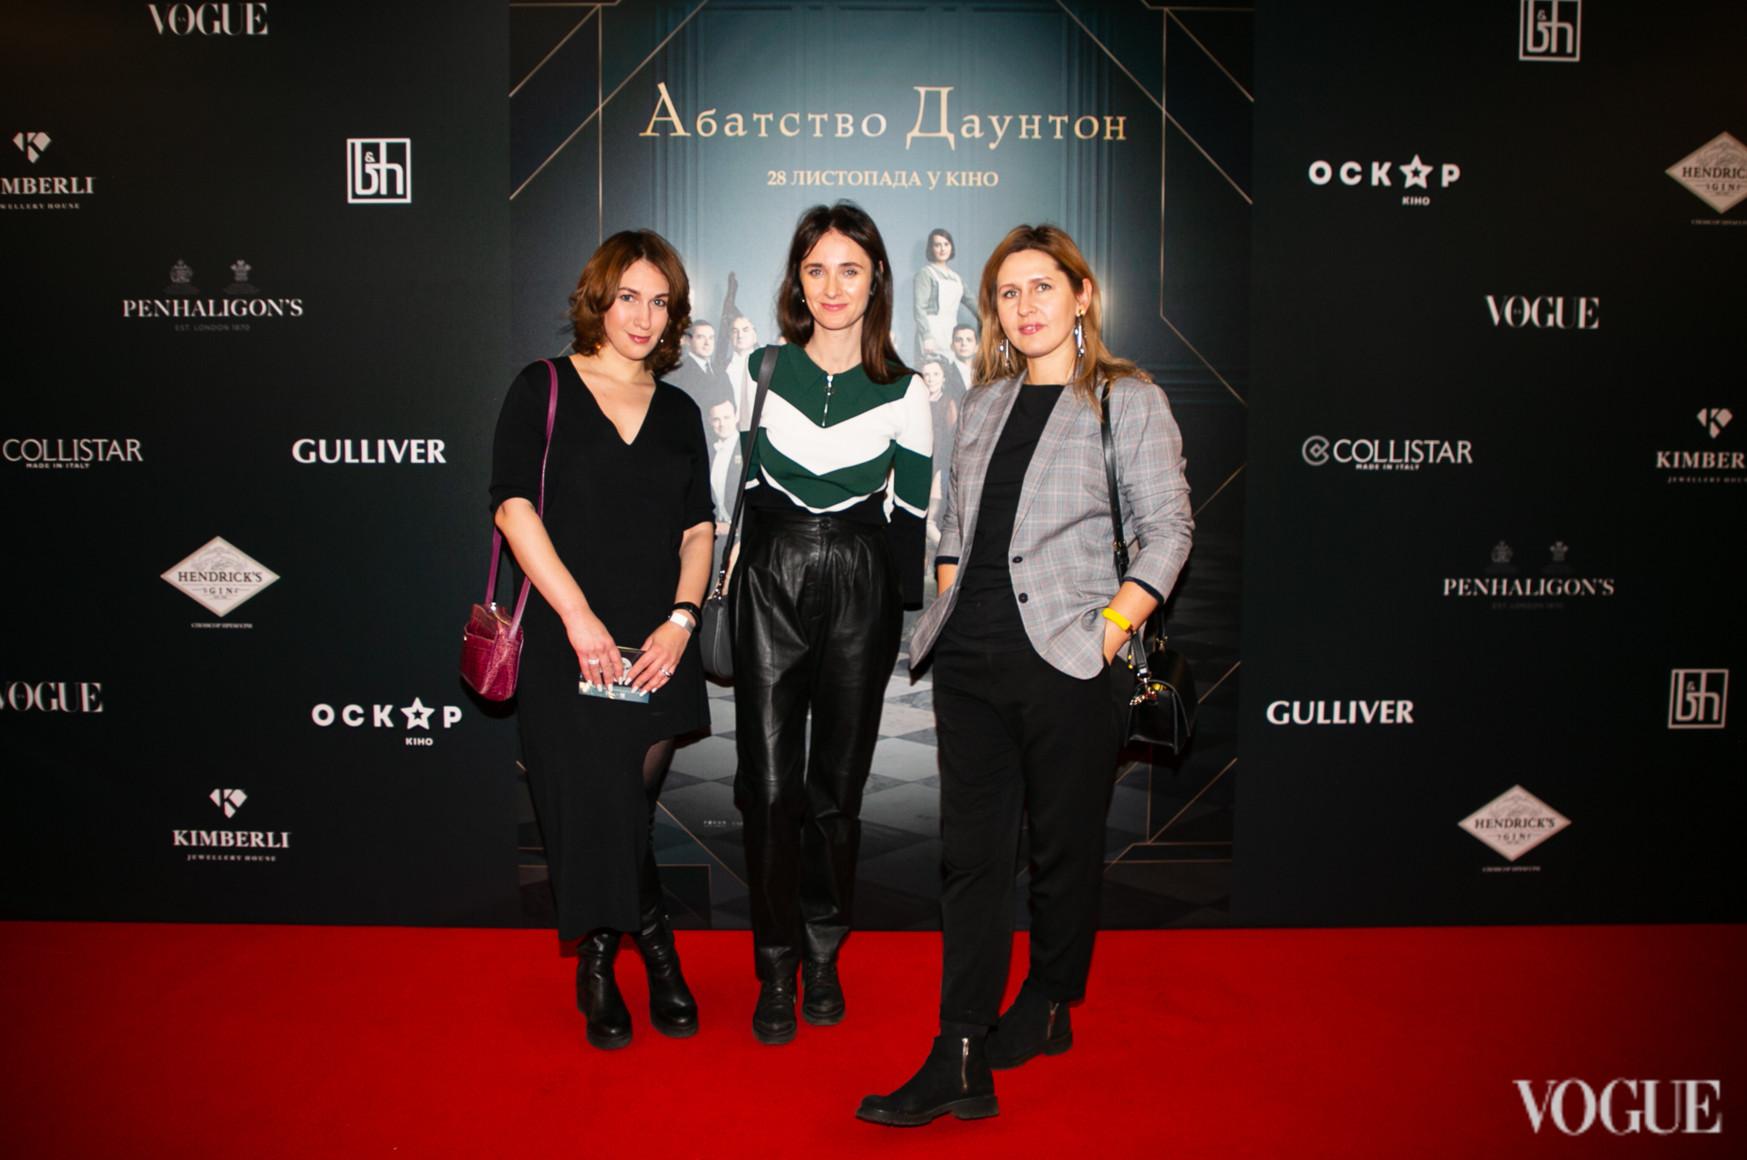 Дарья Слободяник, Ксения Шагова и Алена Пономаренко